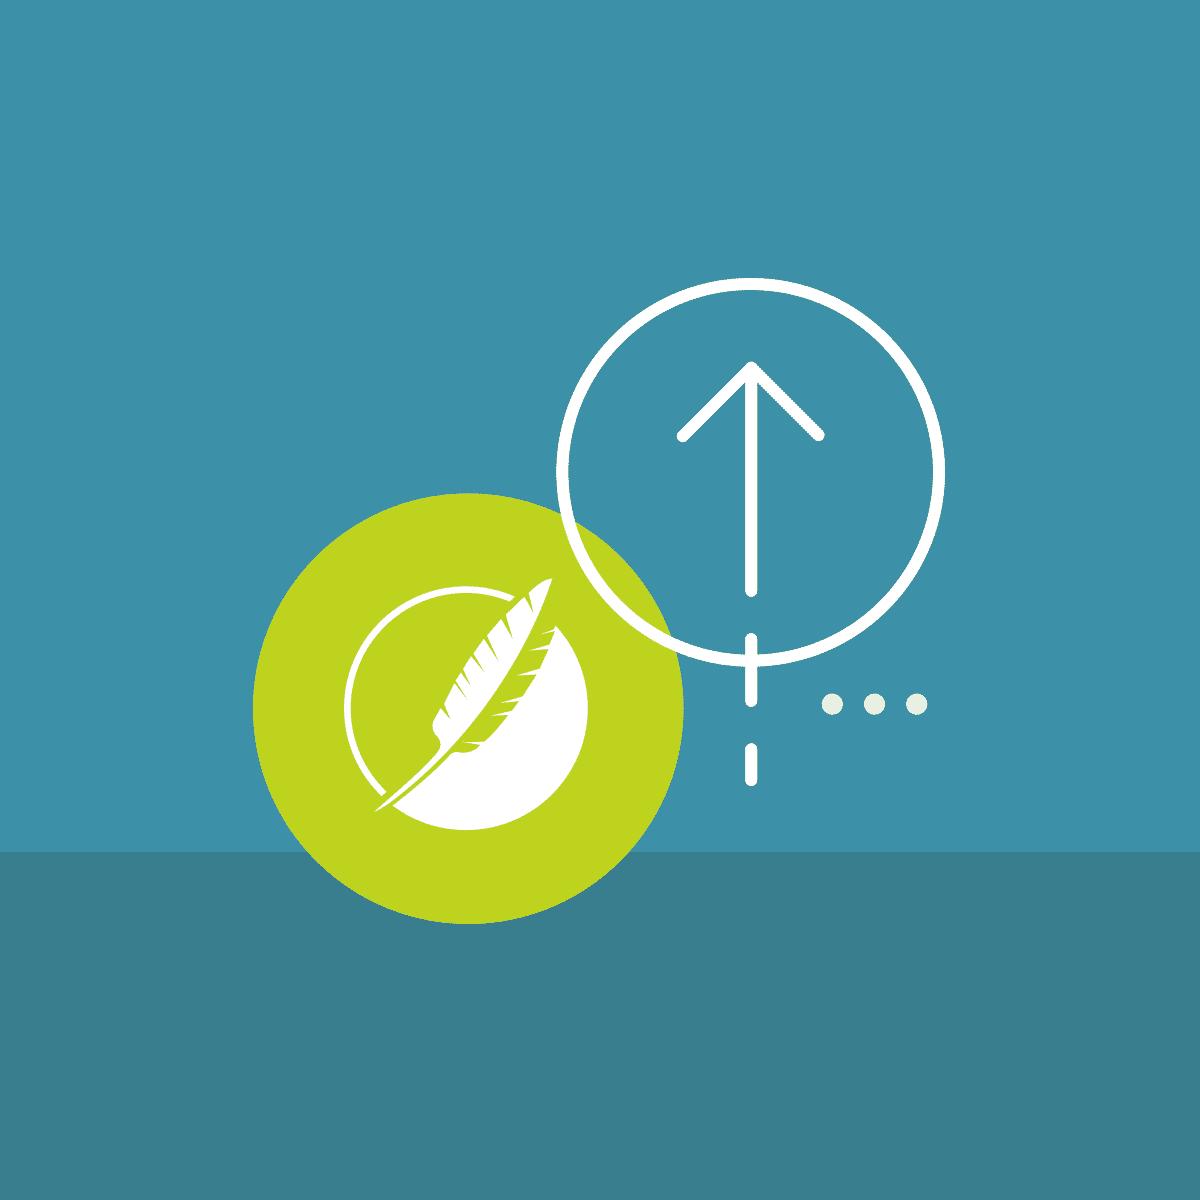 madcap flare with arrow symbol